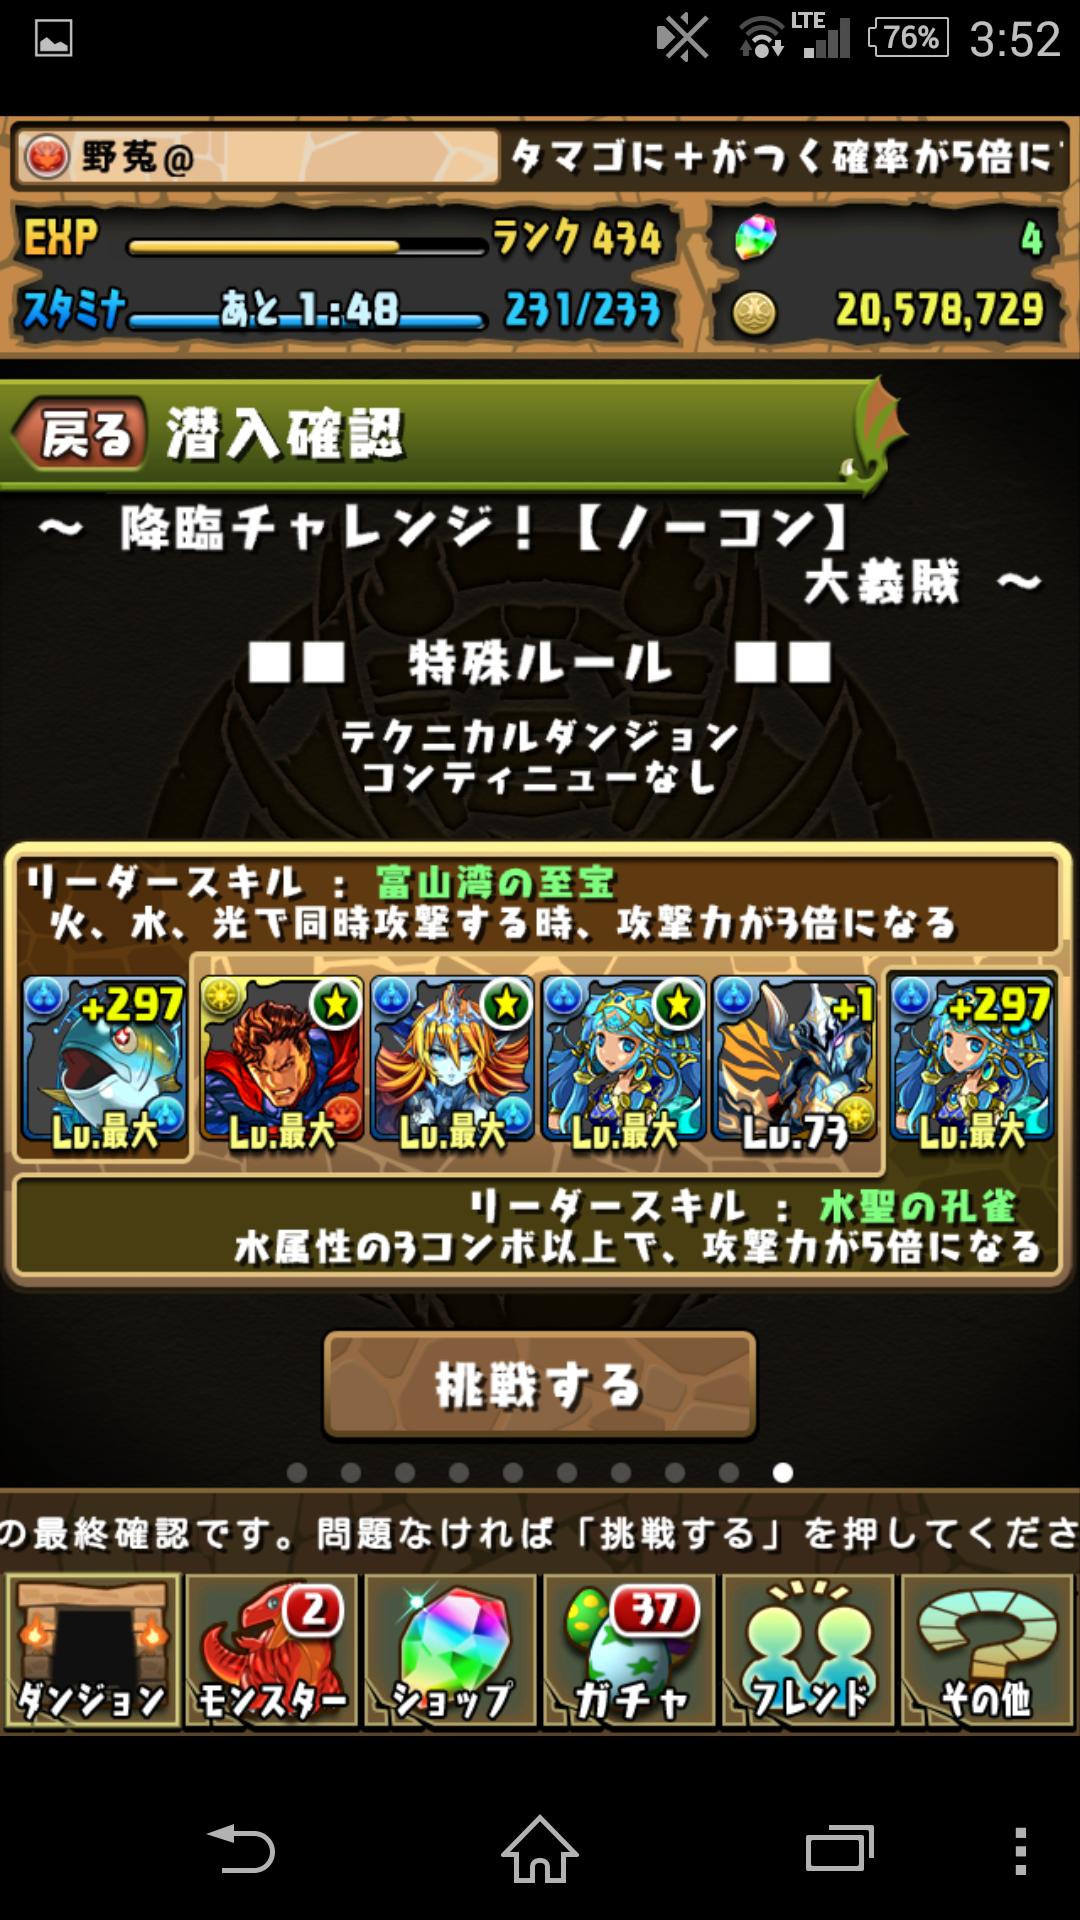 Screenshot_2014-12-16-03-52-53.png